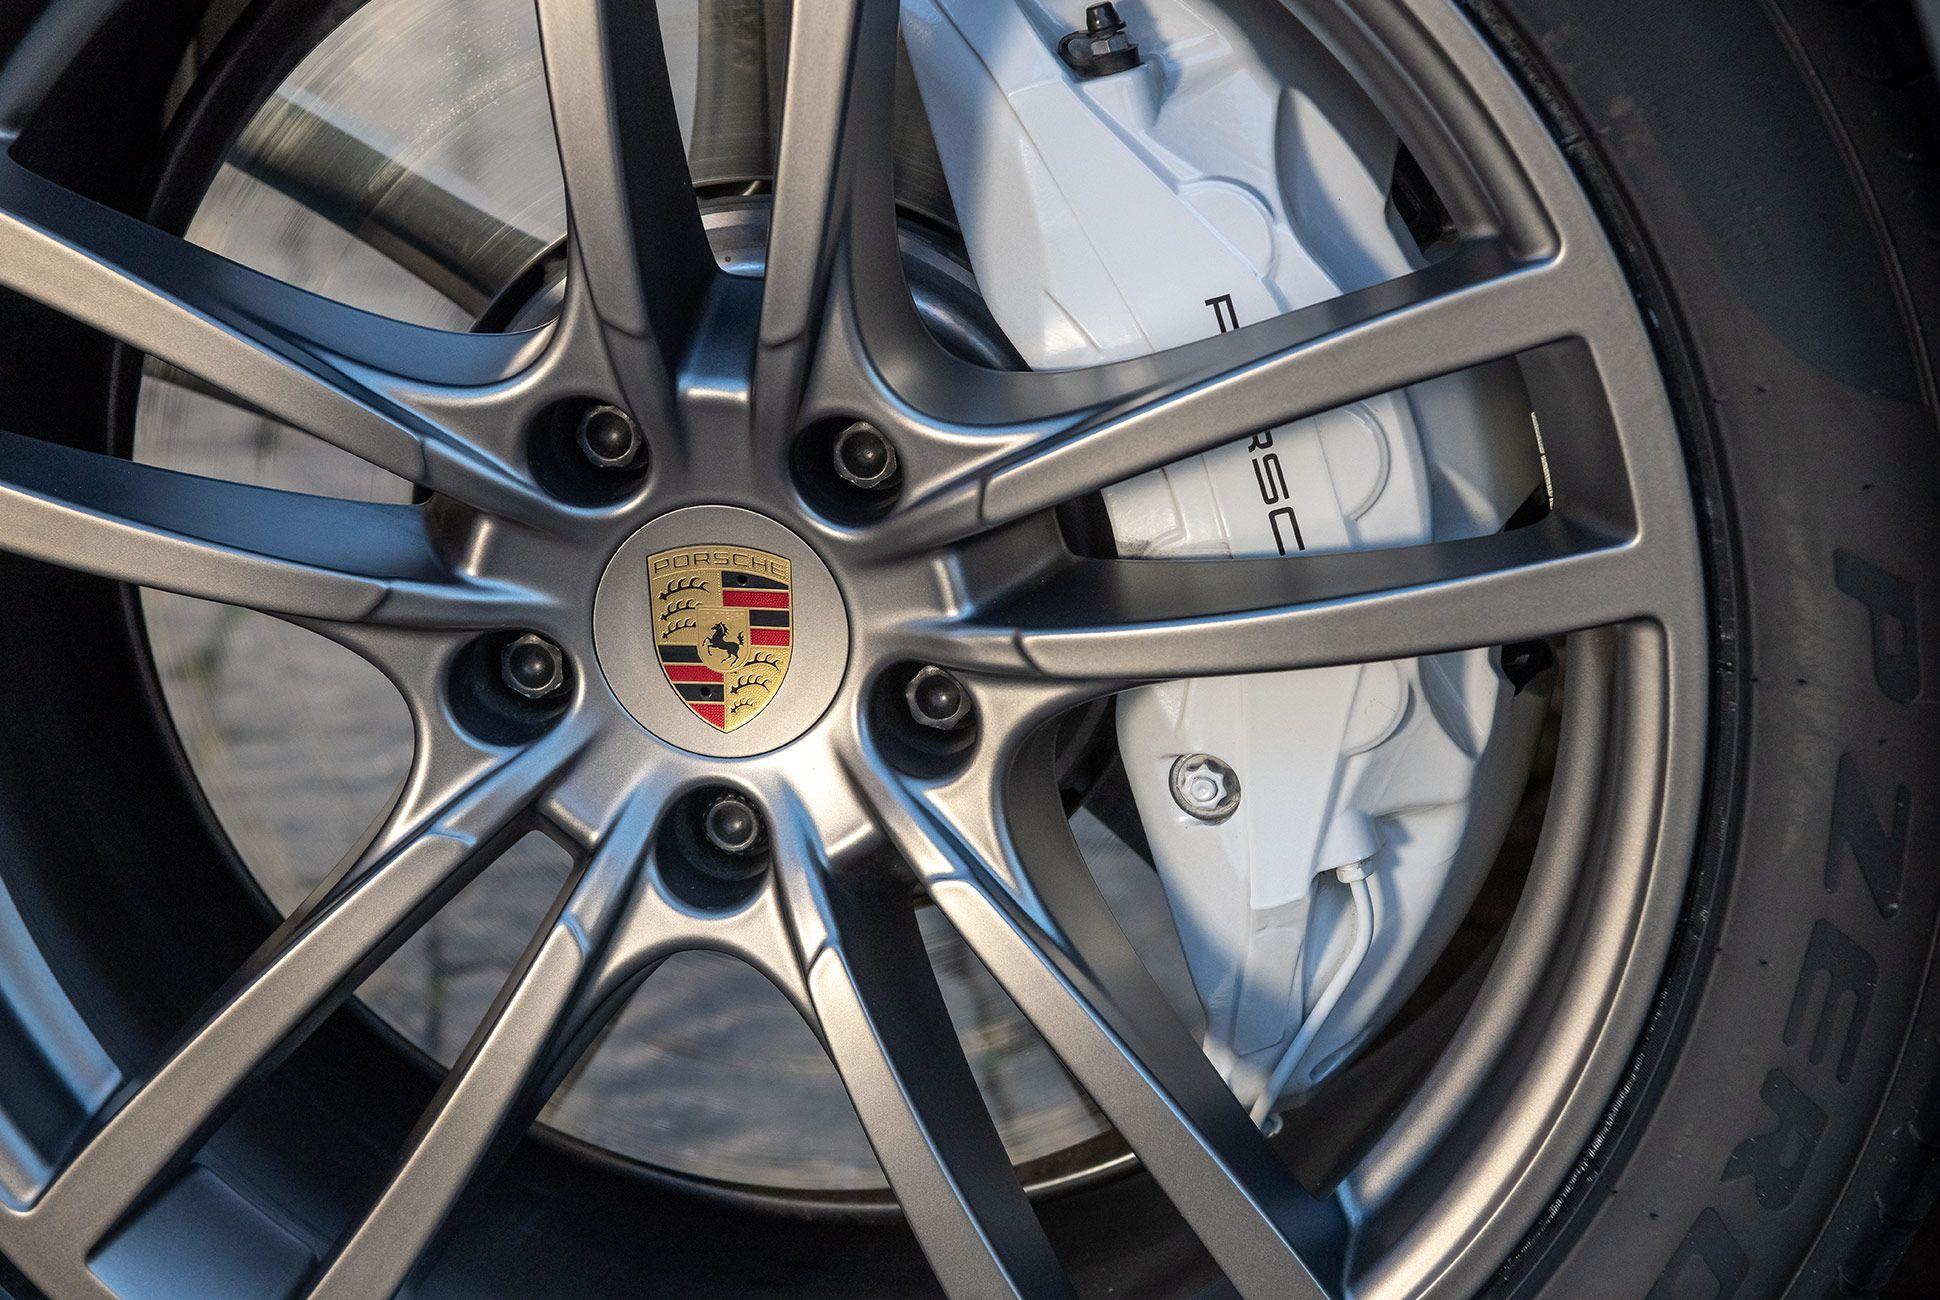 Porsche-Cayenne-Review-gear-patrol-slide-9